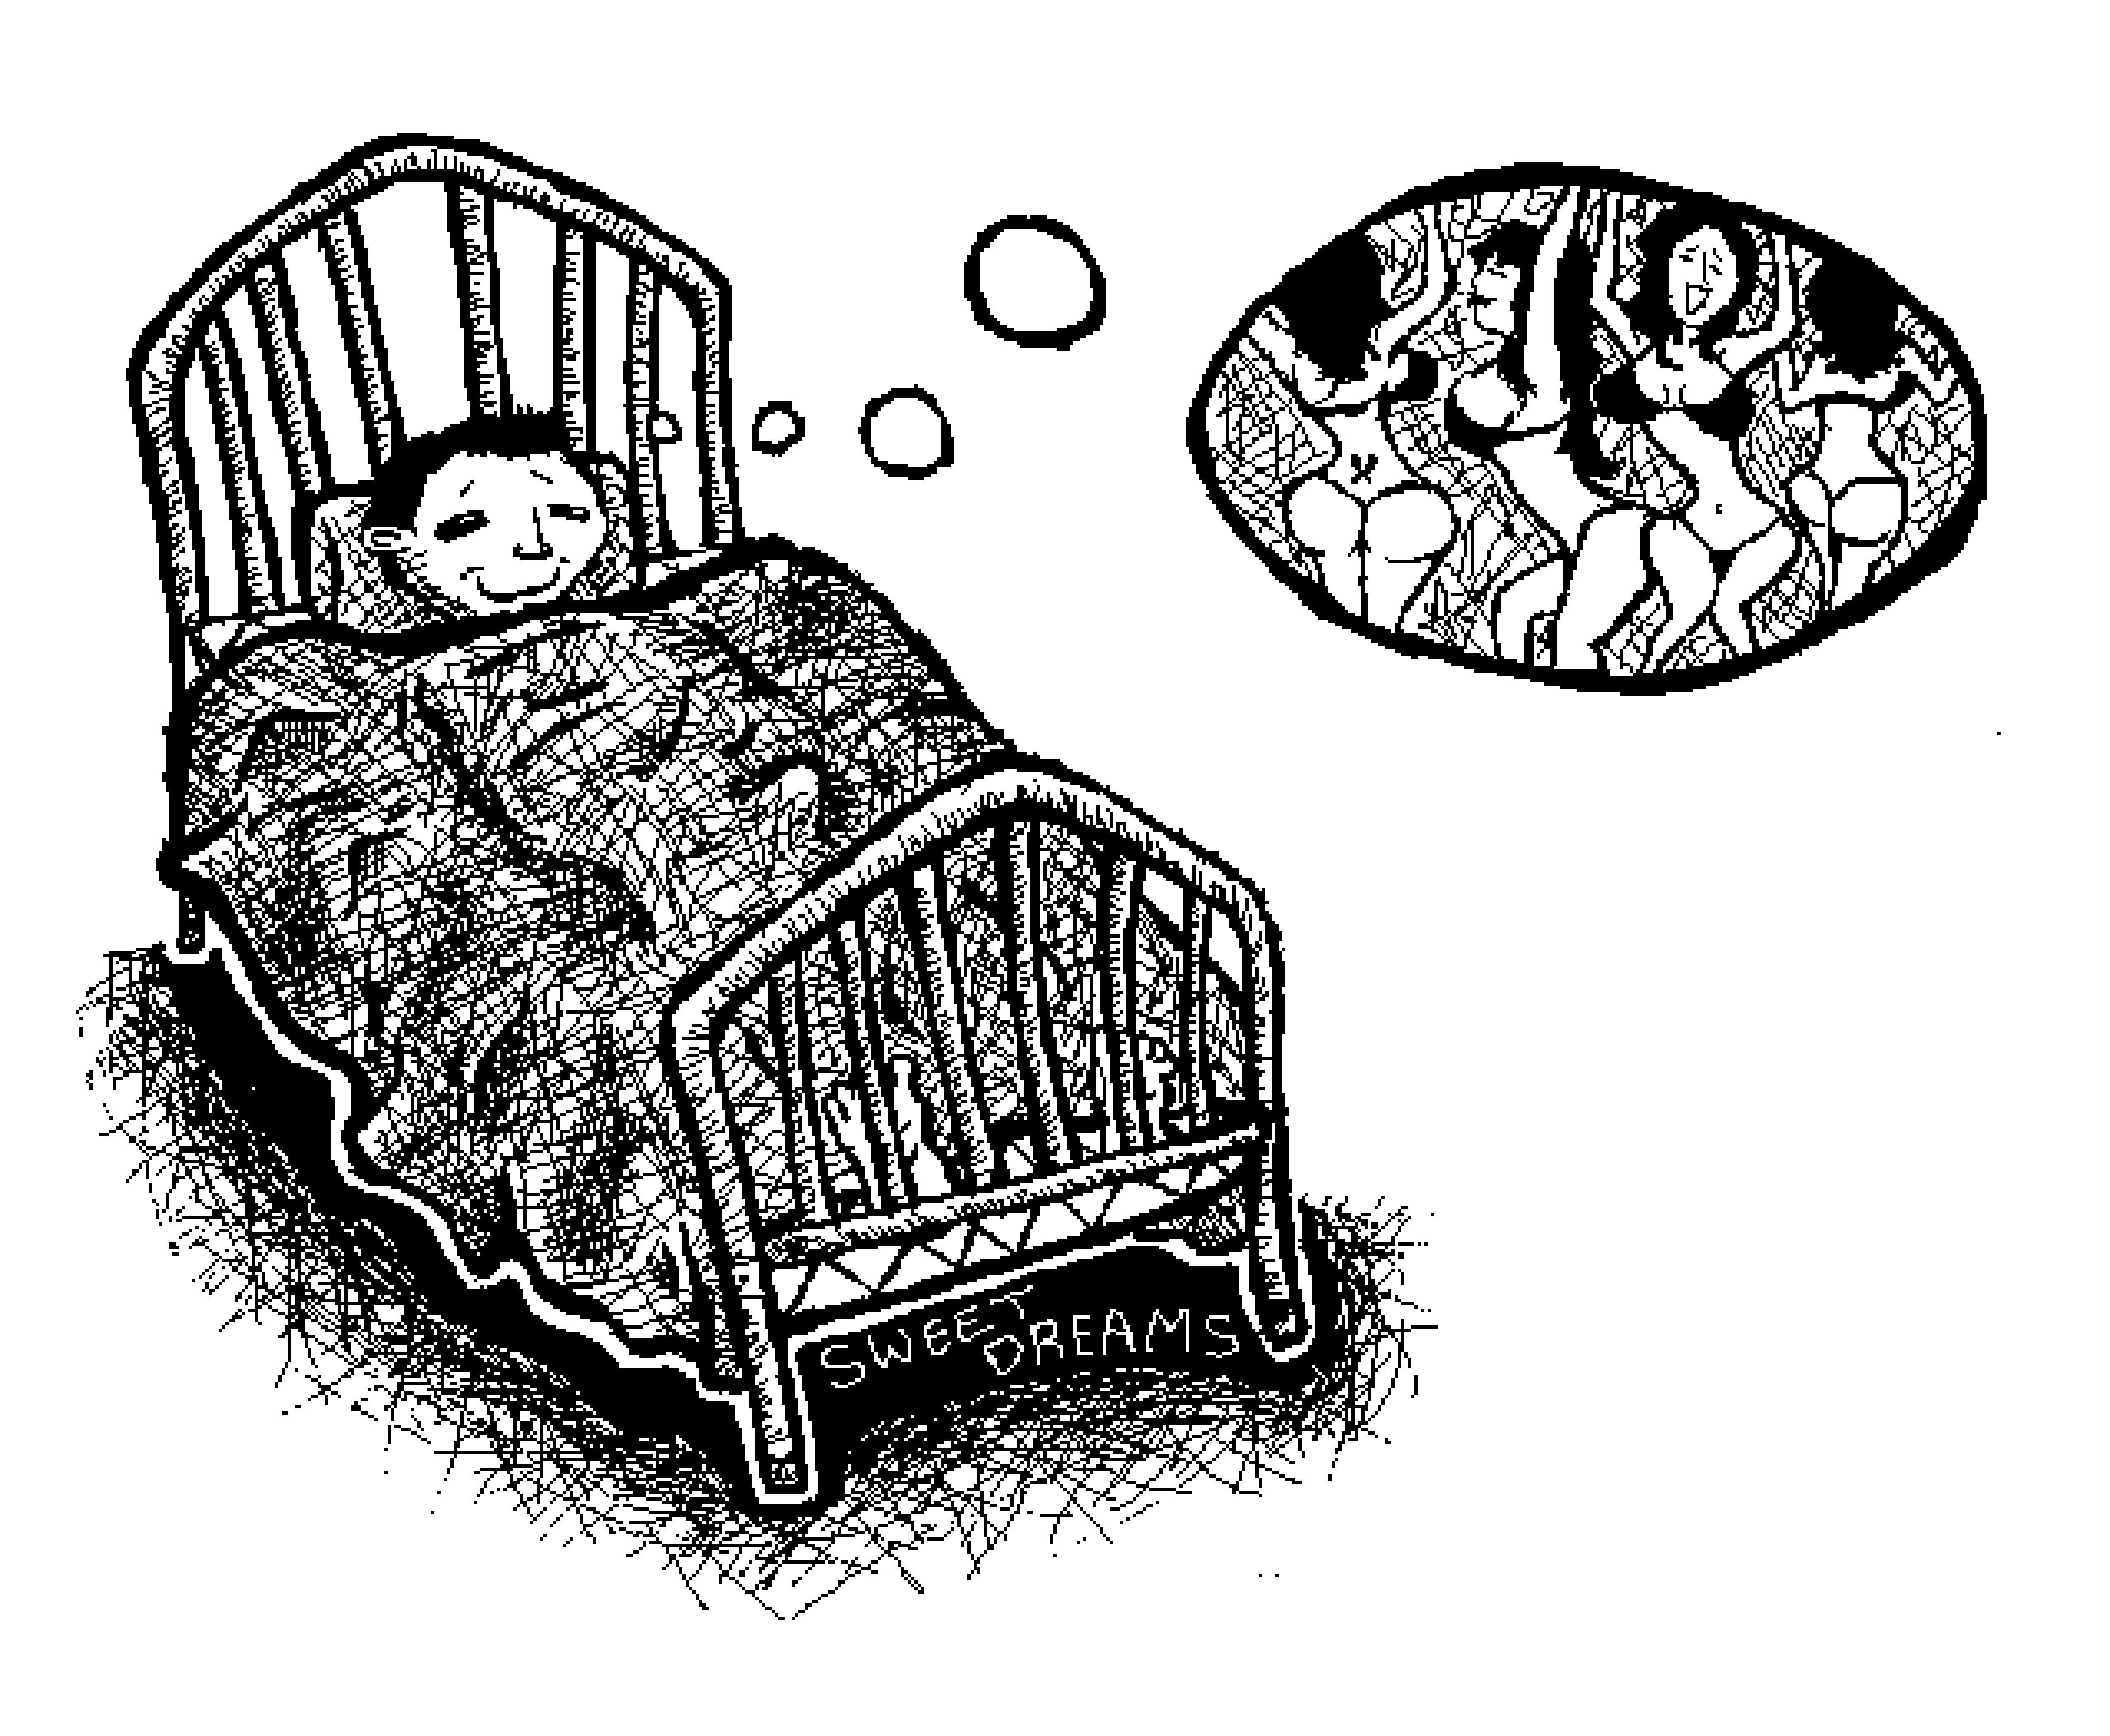 Sweet Dreams. Wet dreams for everyone. boobies